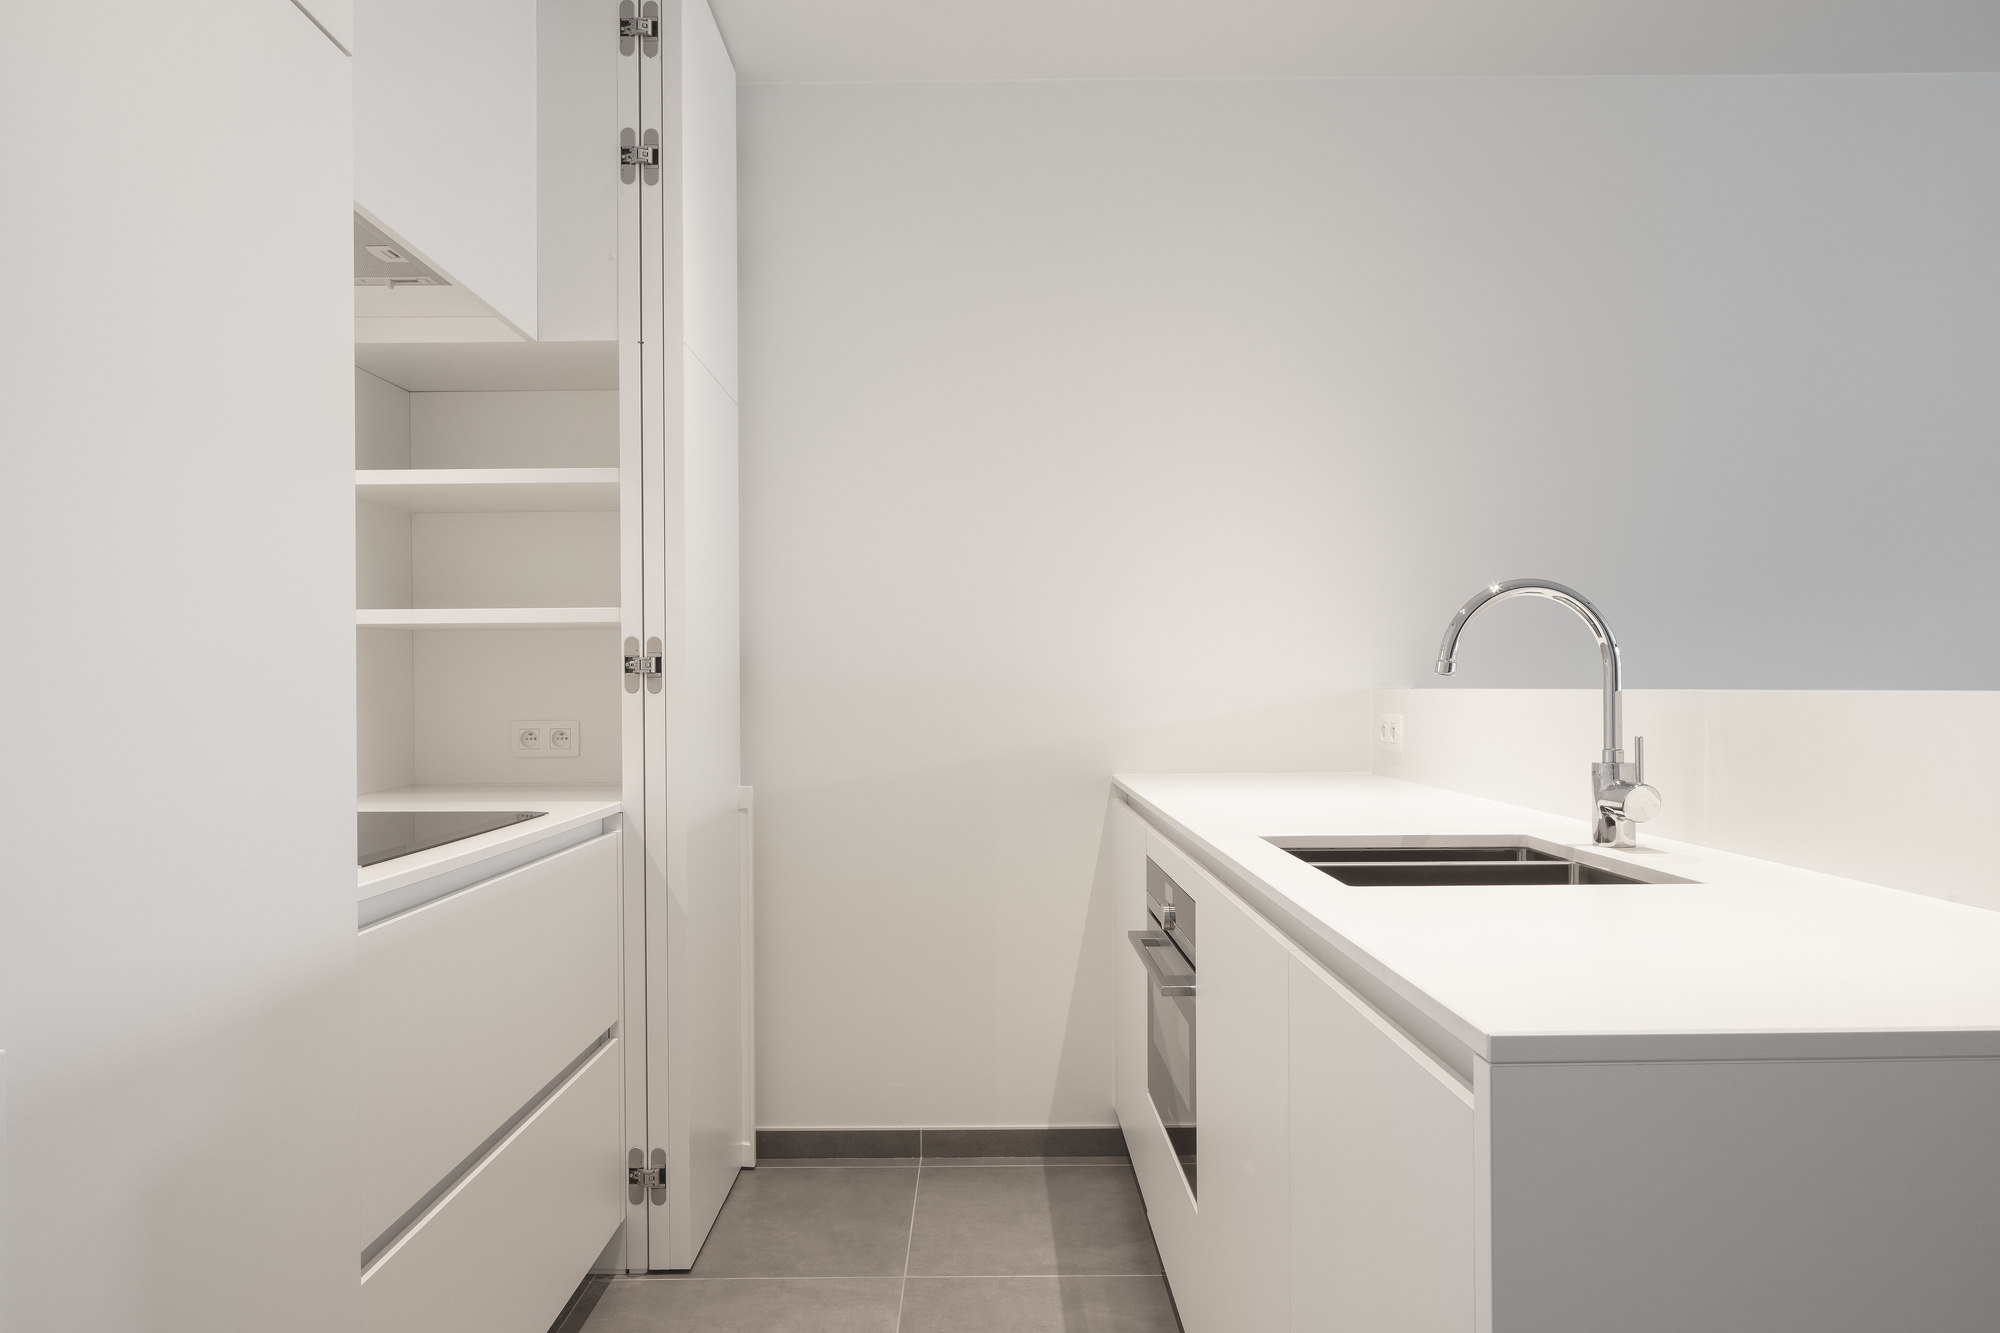 Witte Minimalistische Woonkeuken : Strakke minimalistische keuken onze realisaties trybou keukens